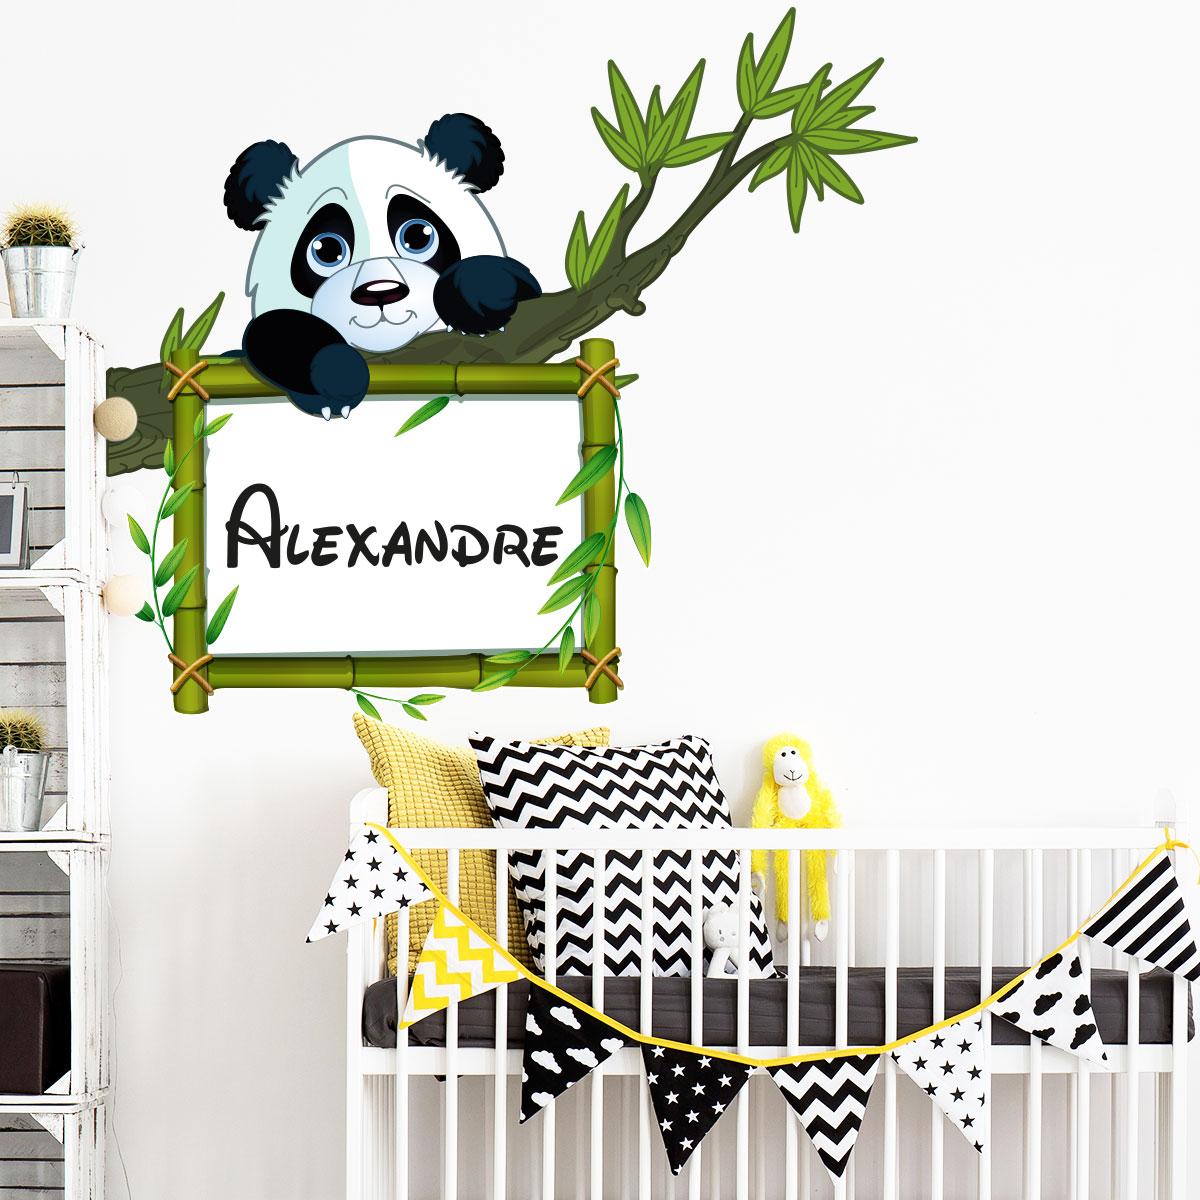 sticker pr nom personnalis panda sur sa branche. Black Bedroom Furniture Sets. Home Design Ideas